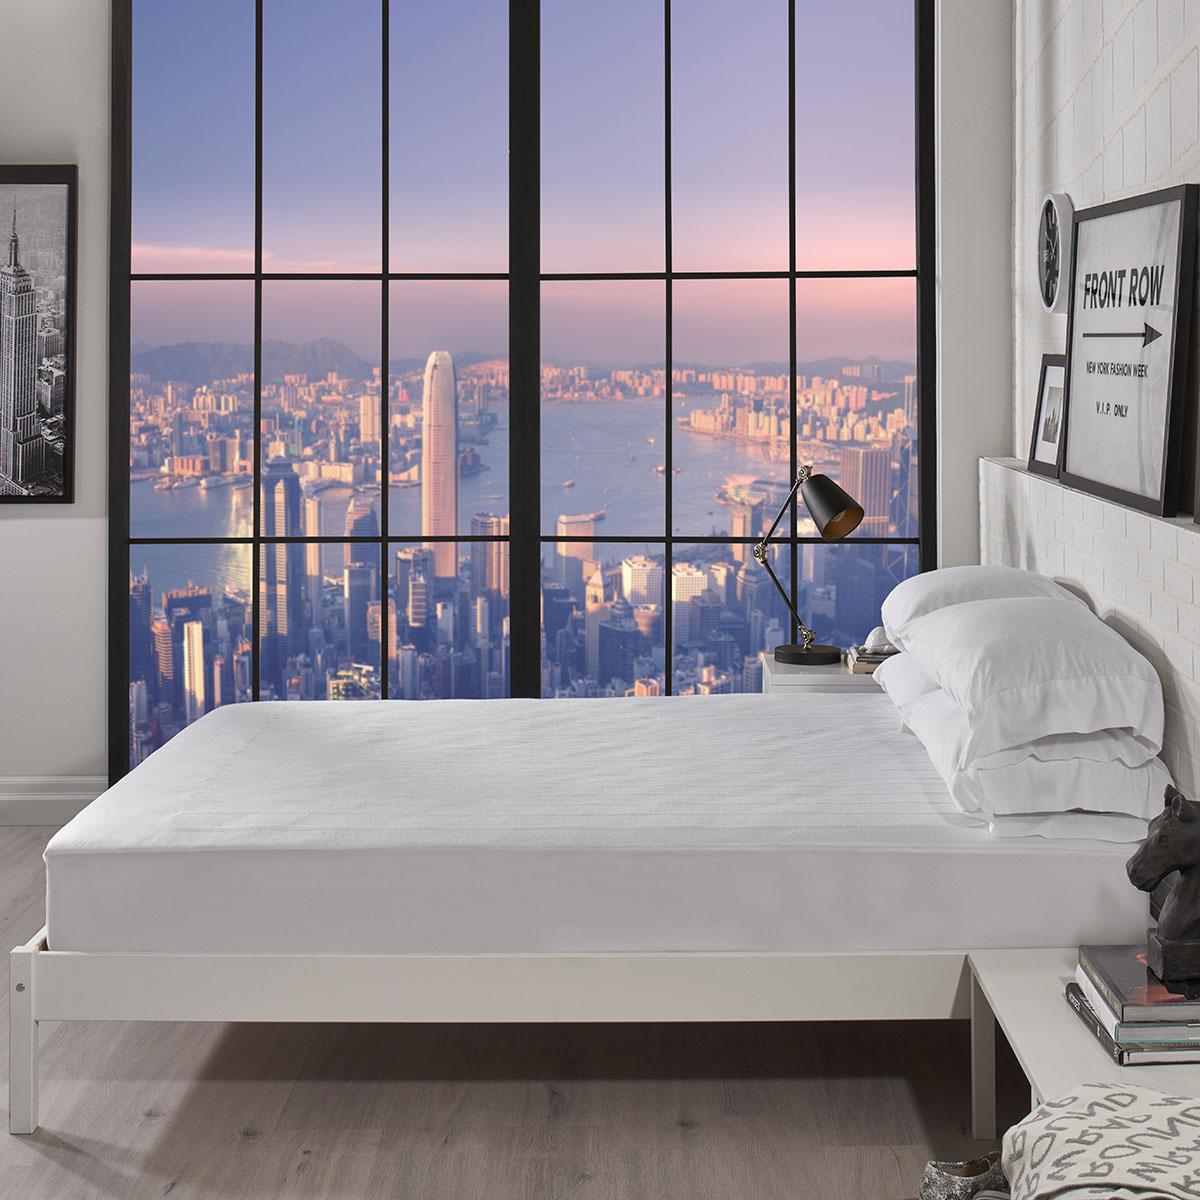 couvre matelas chauffant sunbeam sunbeam canada. Black Bedroom Furniture Sets. Home Design Ideas